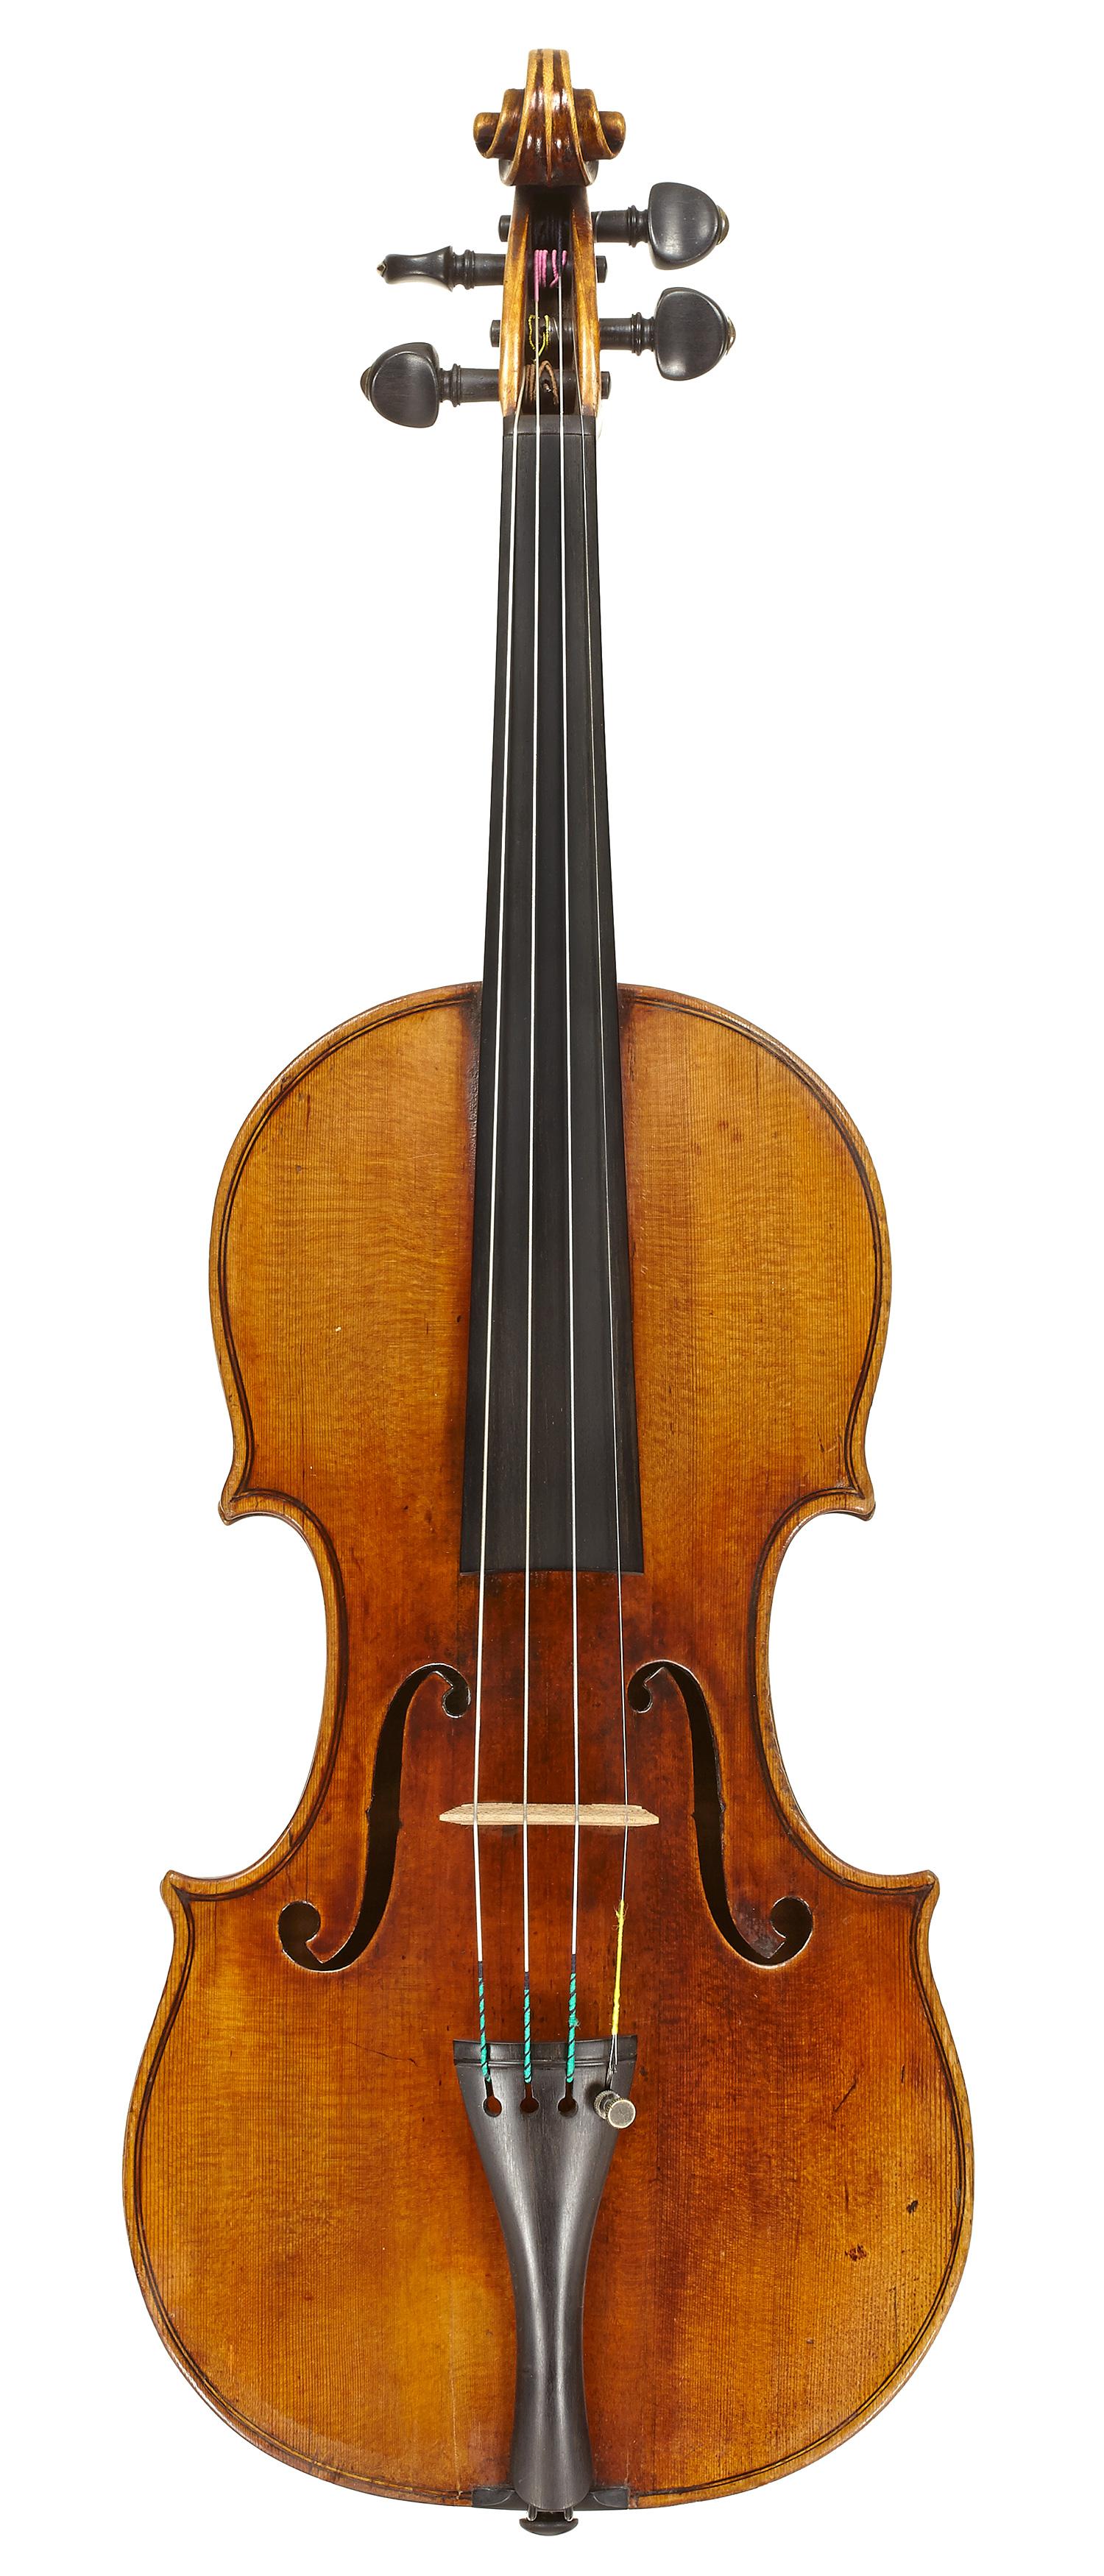 Min Kym's Stradivarius front